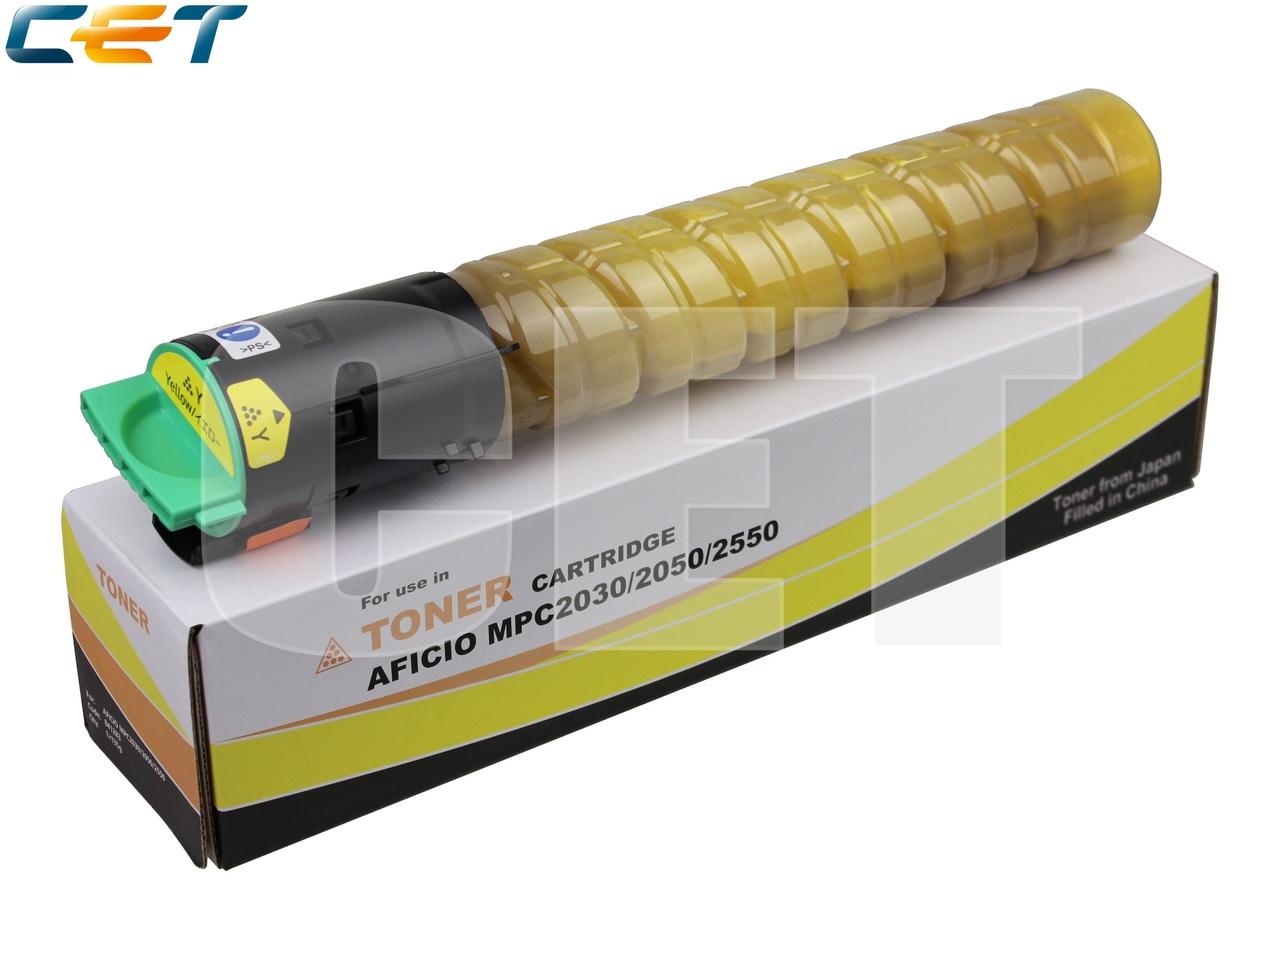 Тонер-картридж (Type 516) 841199 для RICOH AficioMPC2030/MPC2050/MPC2550/MPC2051/MPC2551 (CET) Yellow,135г, 5500 стр., CET6414